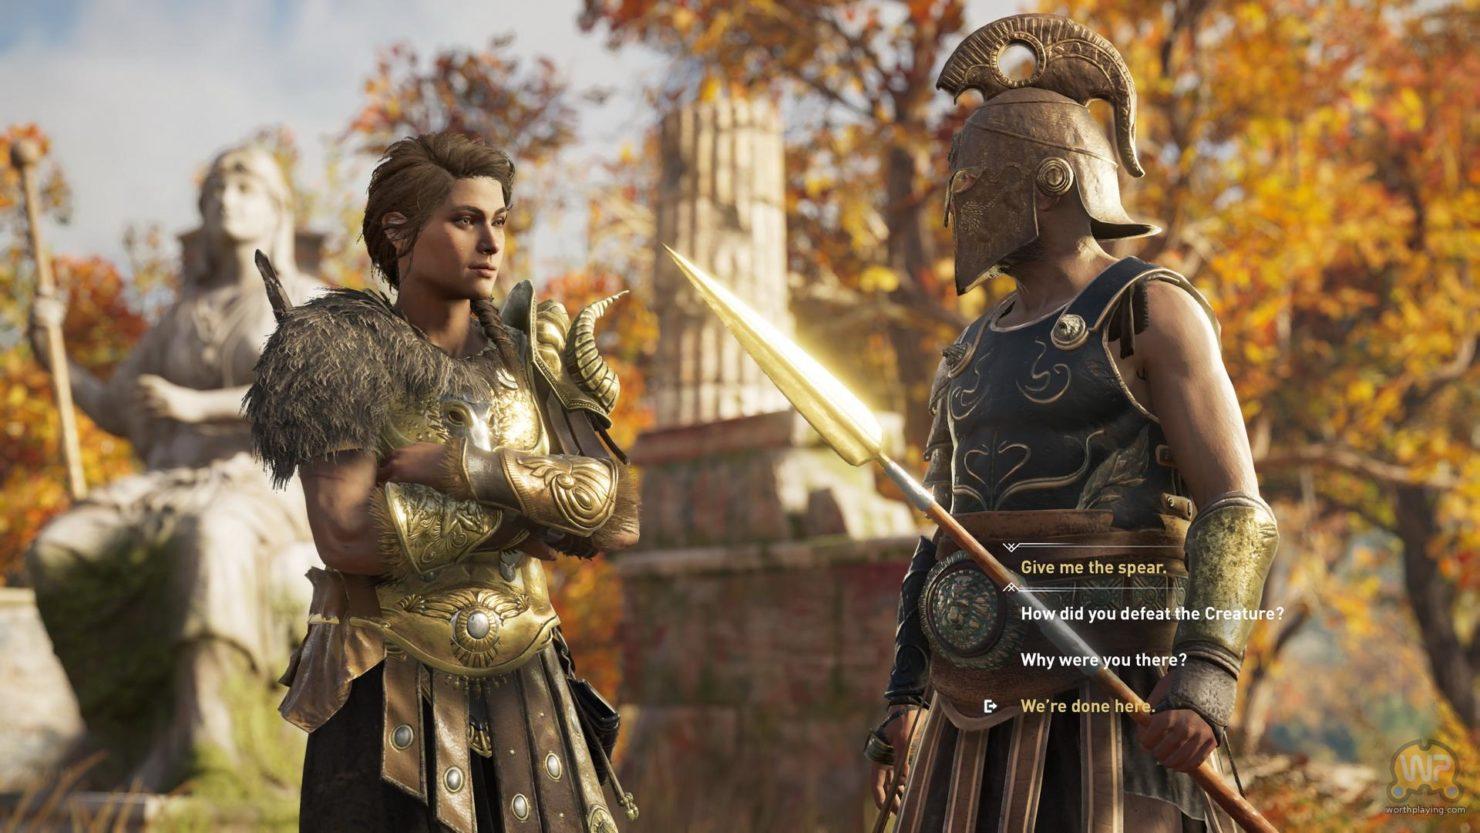 Assassin's Creed Odyssey Kassandra face à un soldat, phase de dialogue